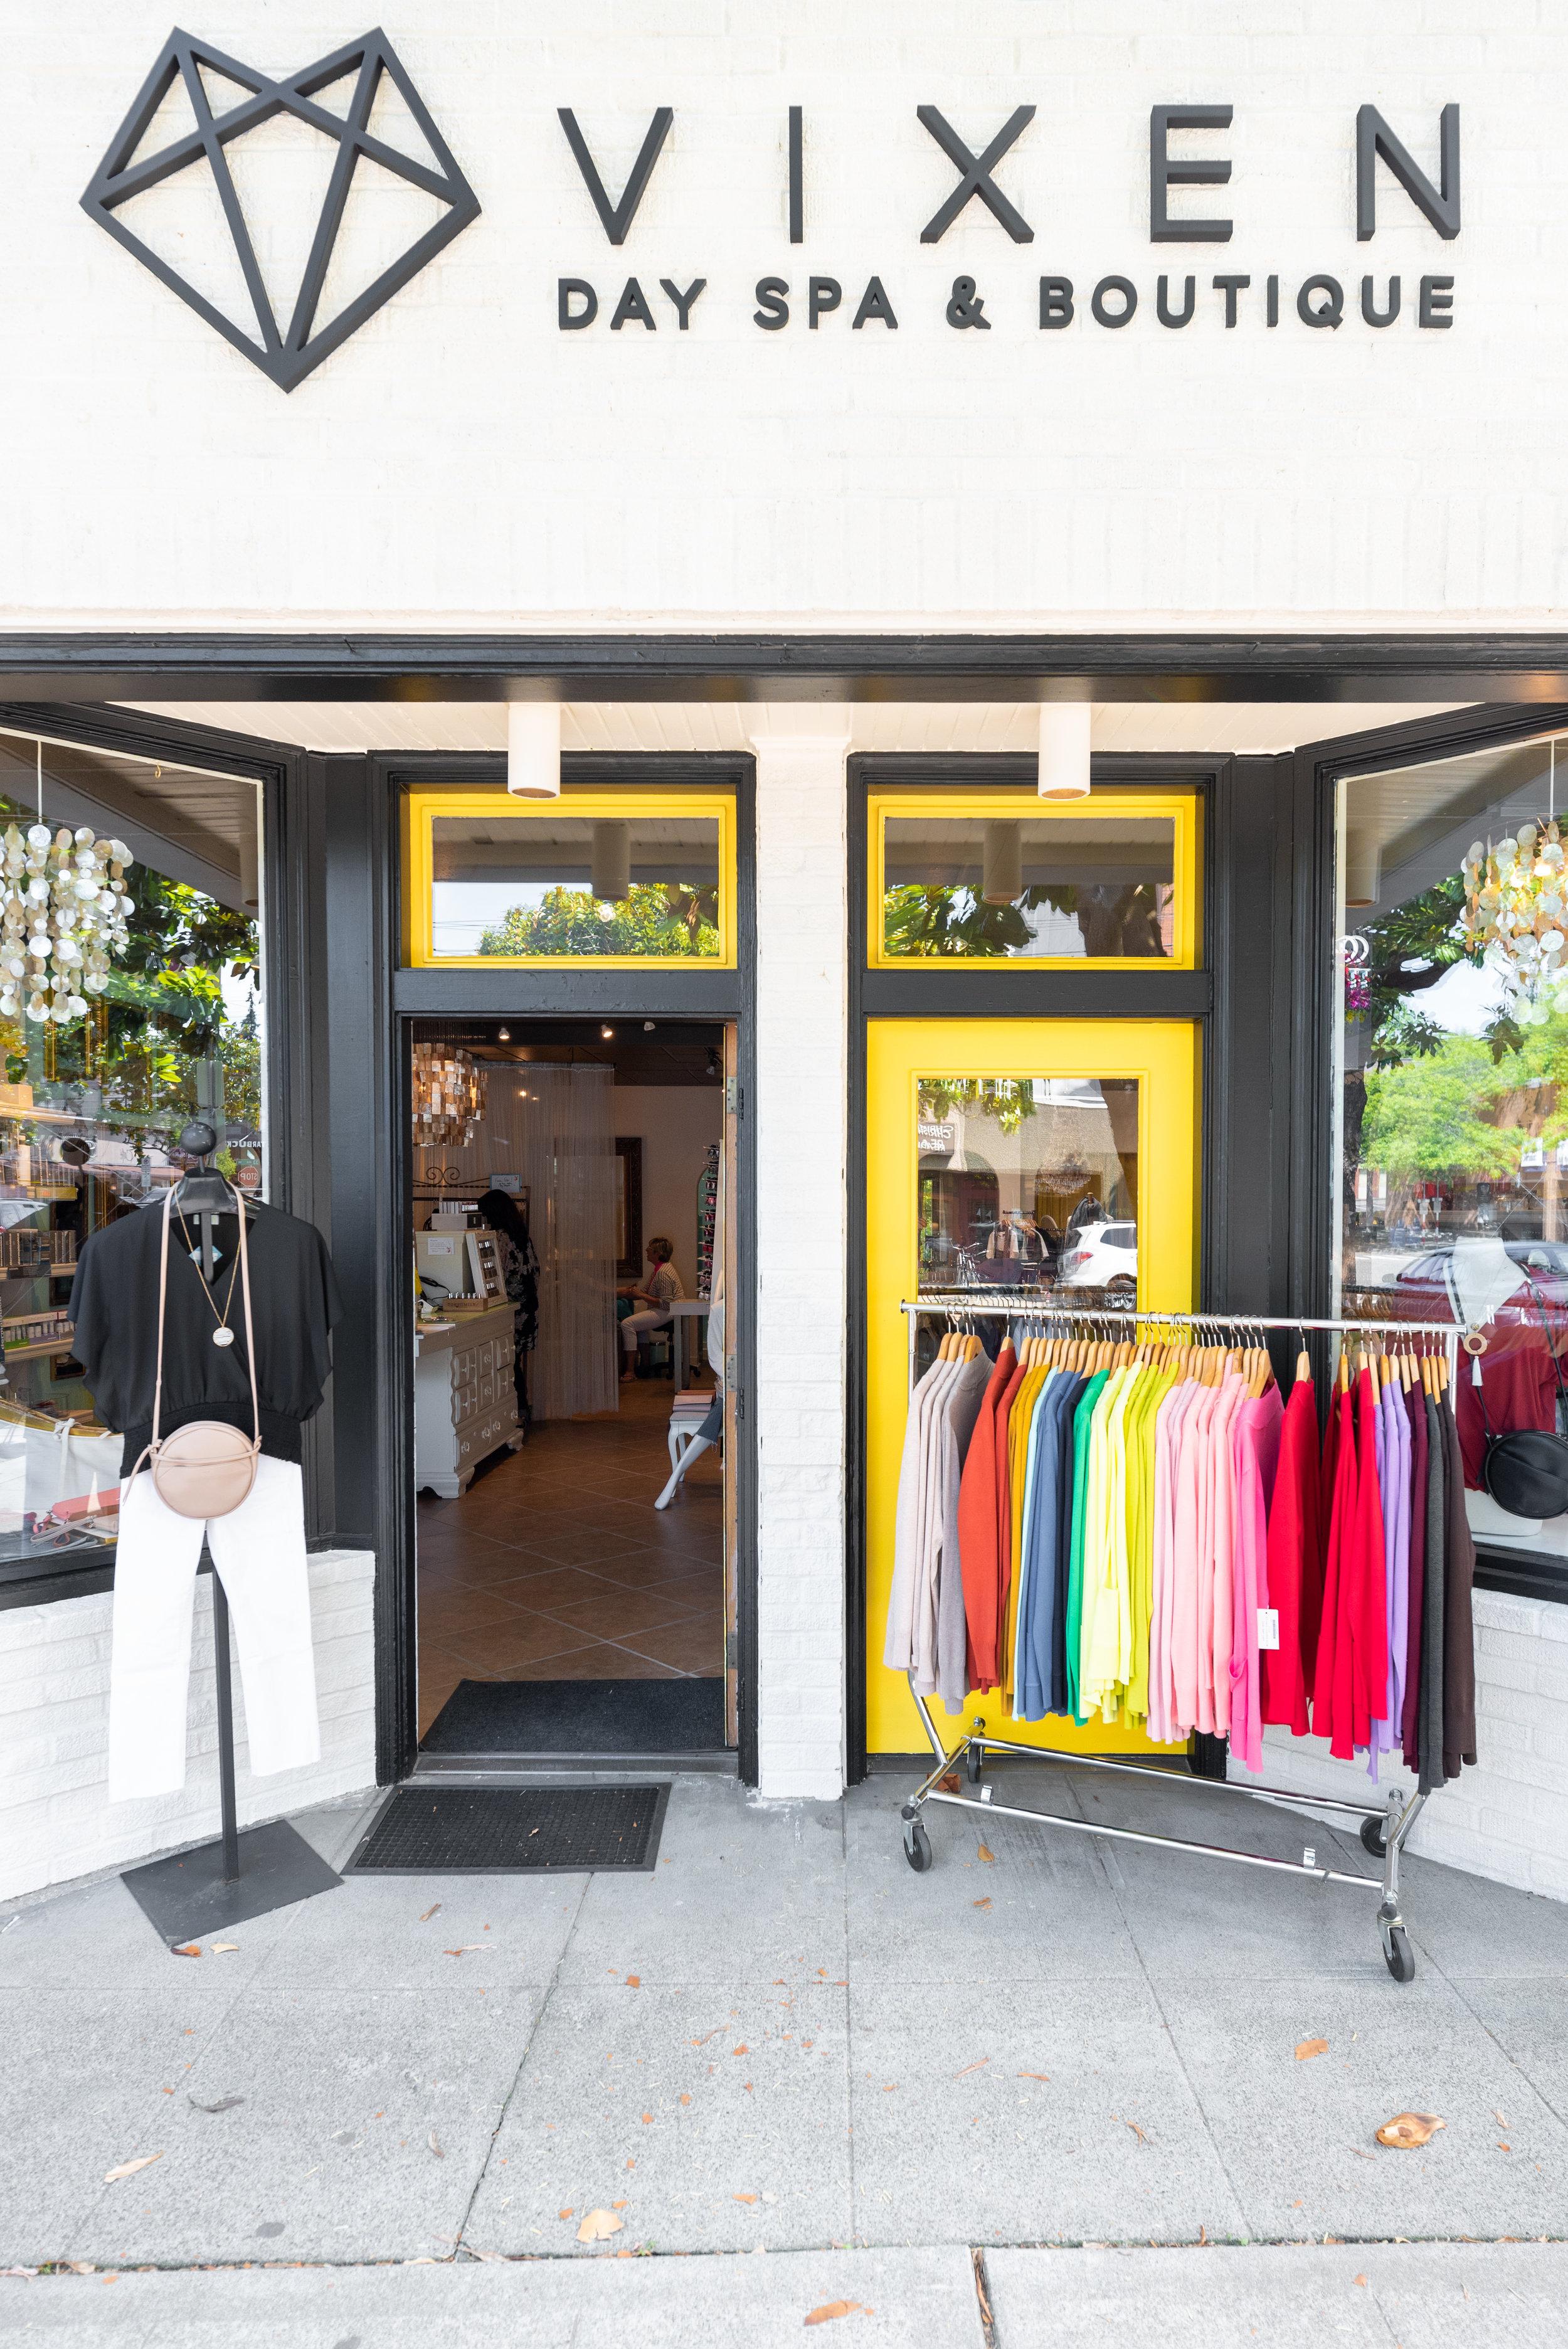 Vixen-Spa-Boutique-June, 19th, 2018 (4 of 14).jpg